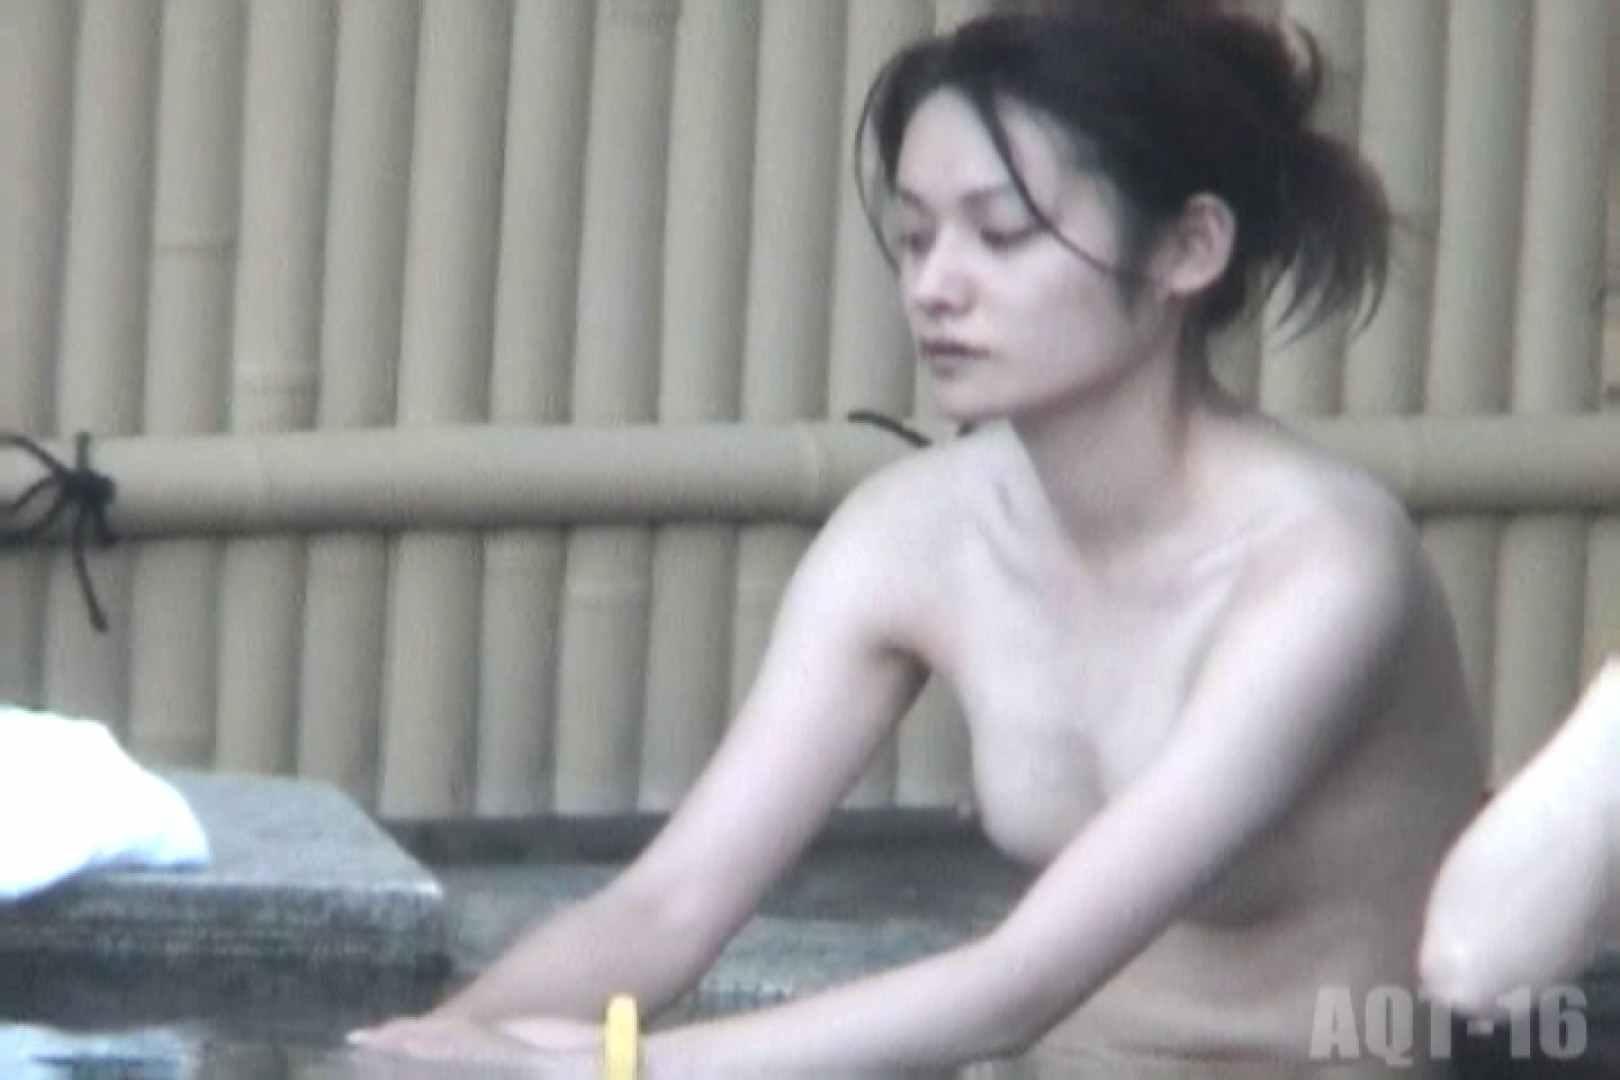 Aquaな露天風呂Vol.839 盗撮師作品  96pic 72